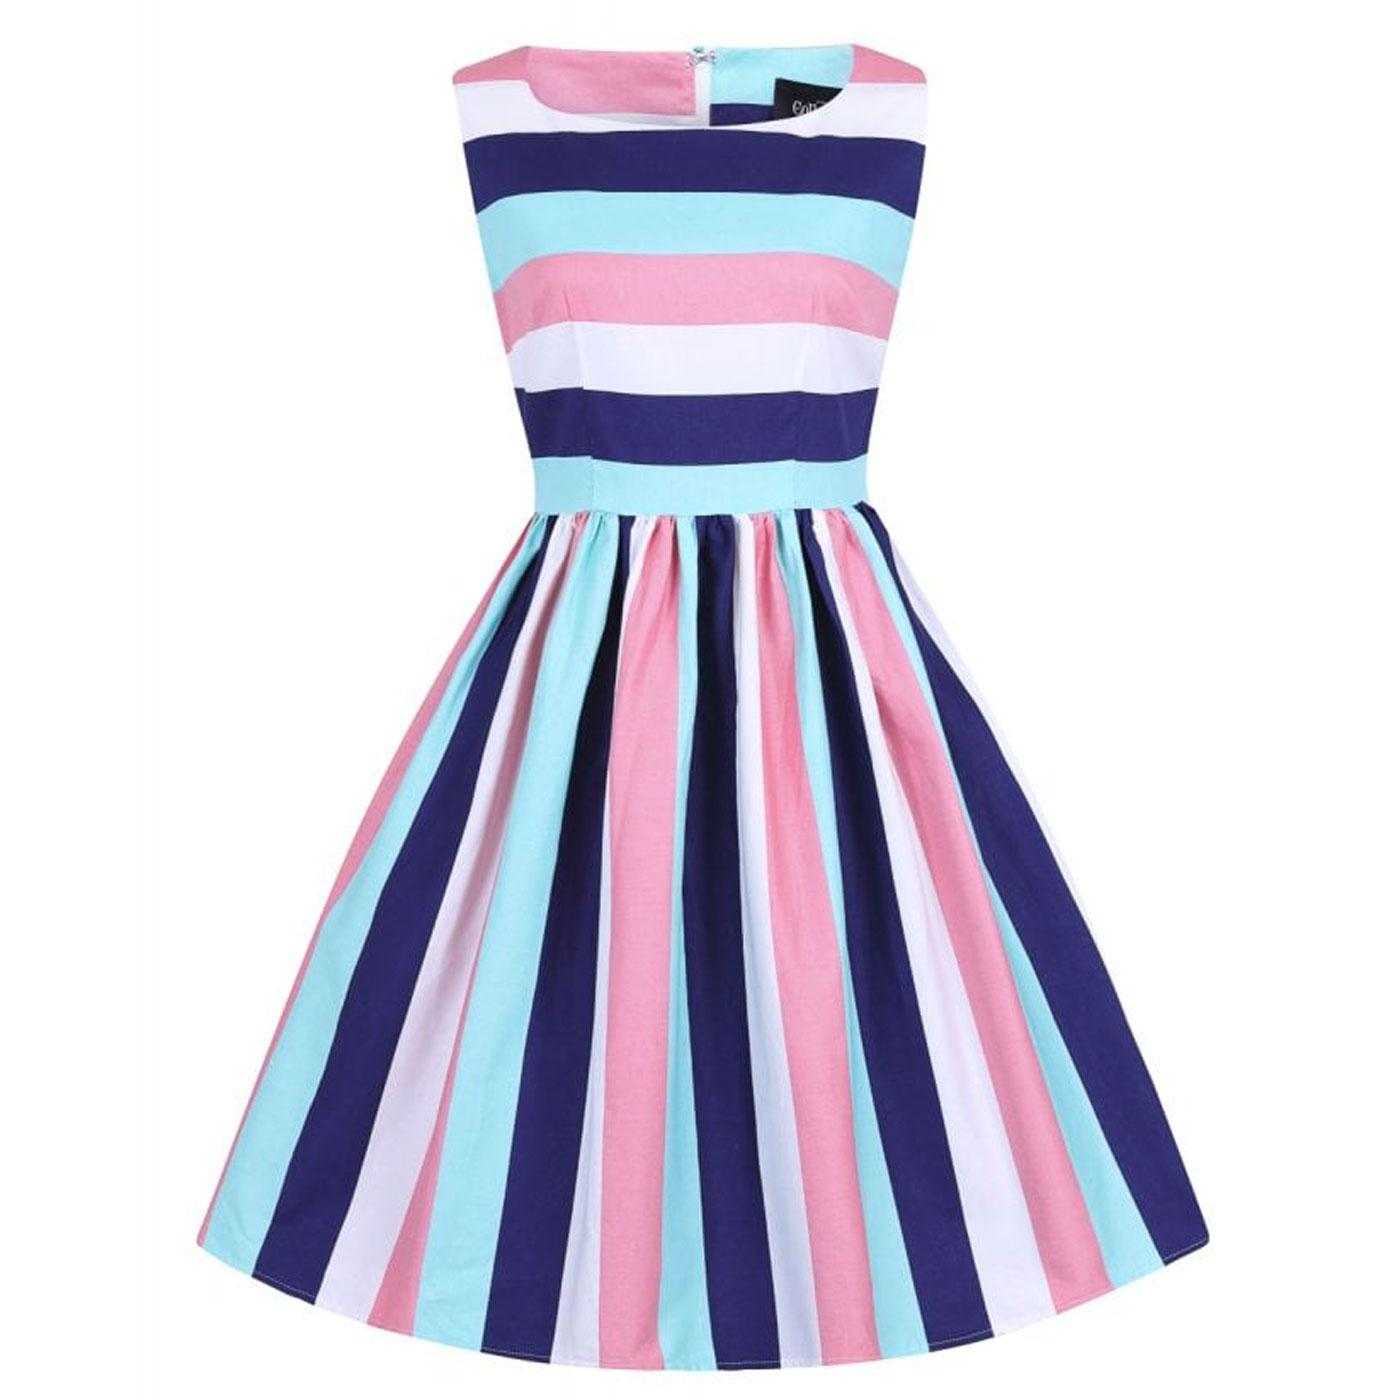 Candice COLLECTIF Retro Seaside Stripe Swing Dress